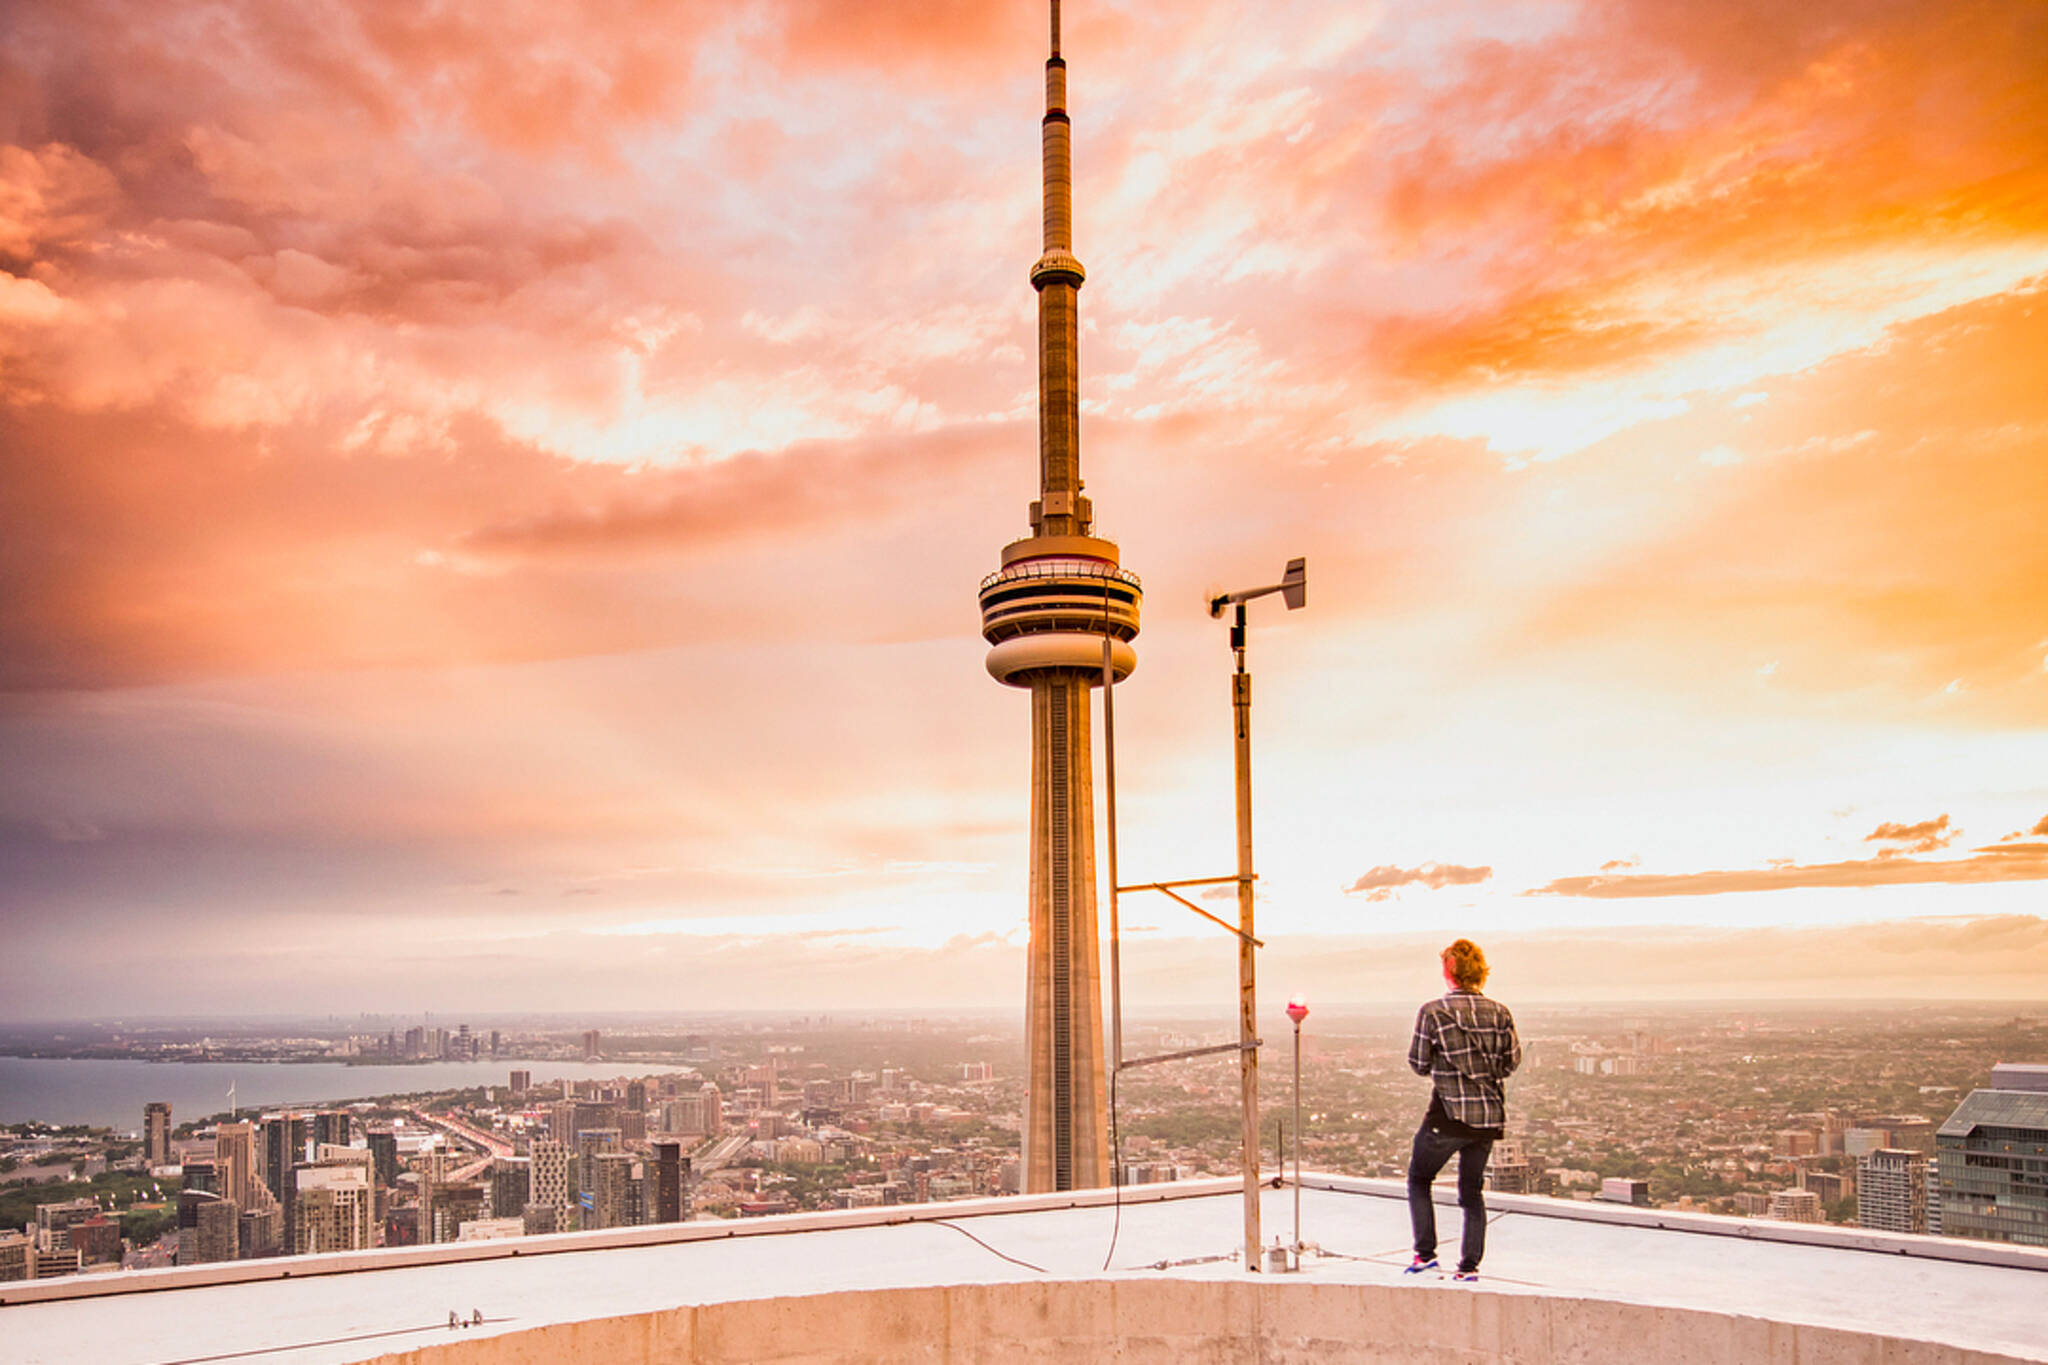 Mercer ranking Toronto